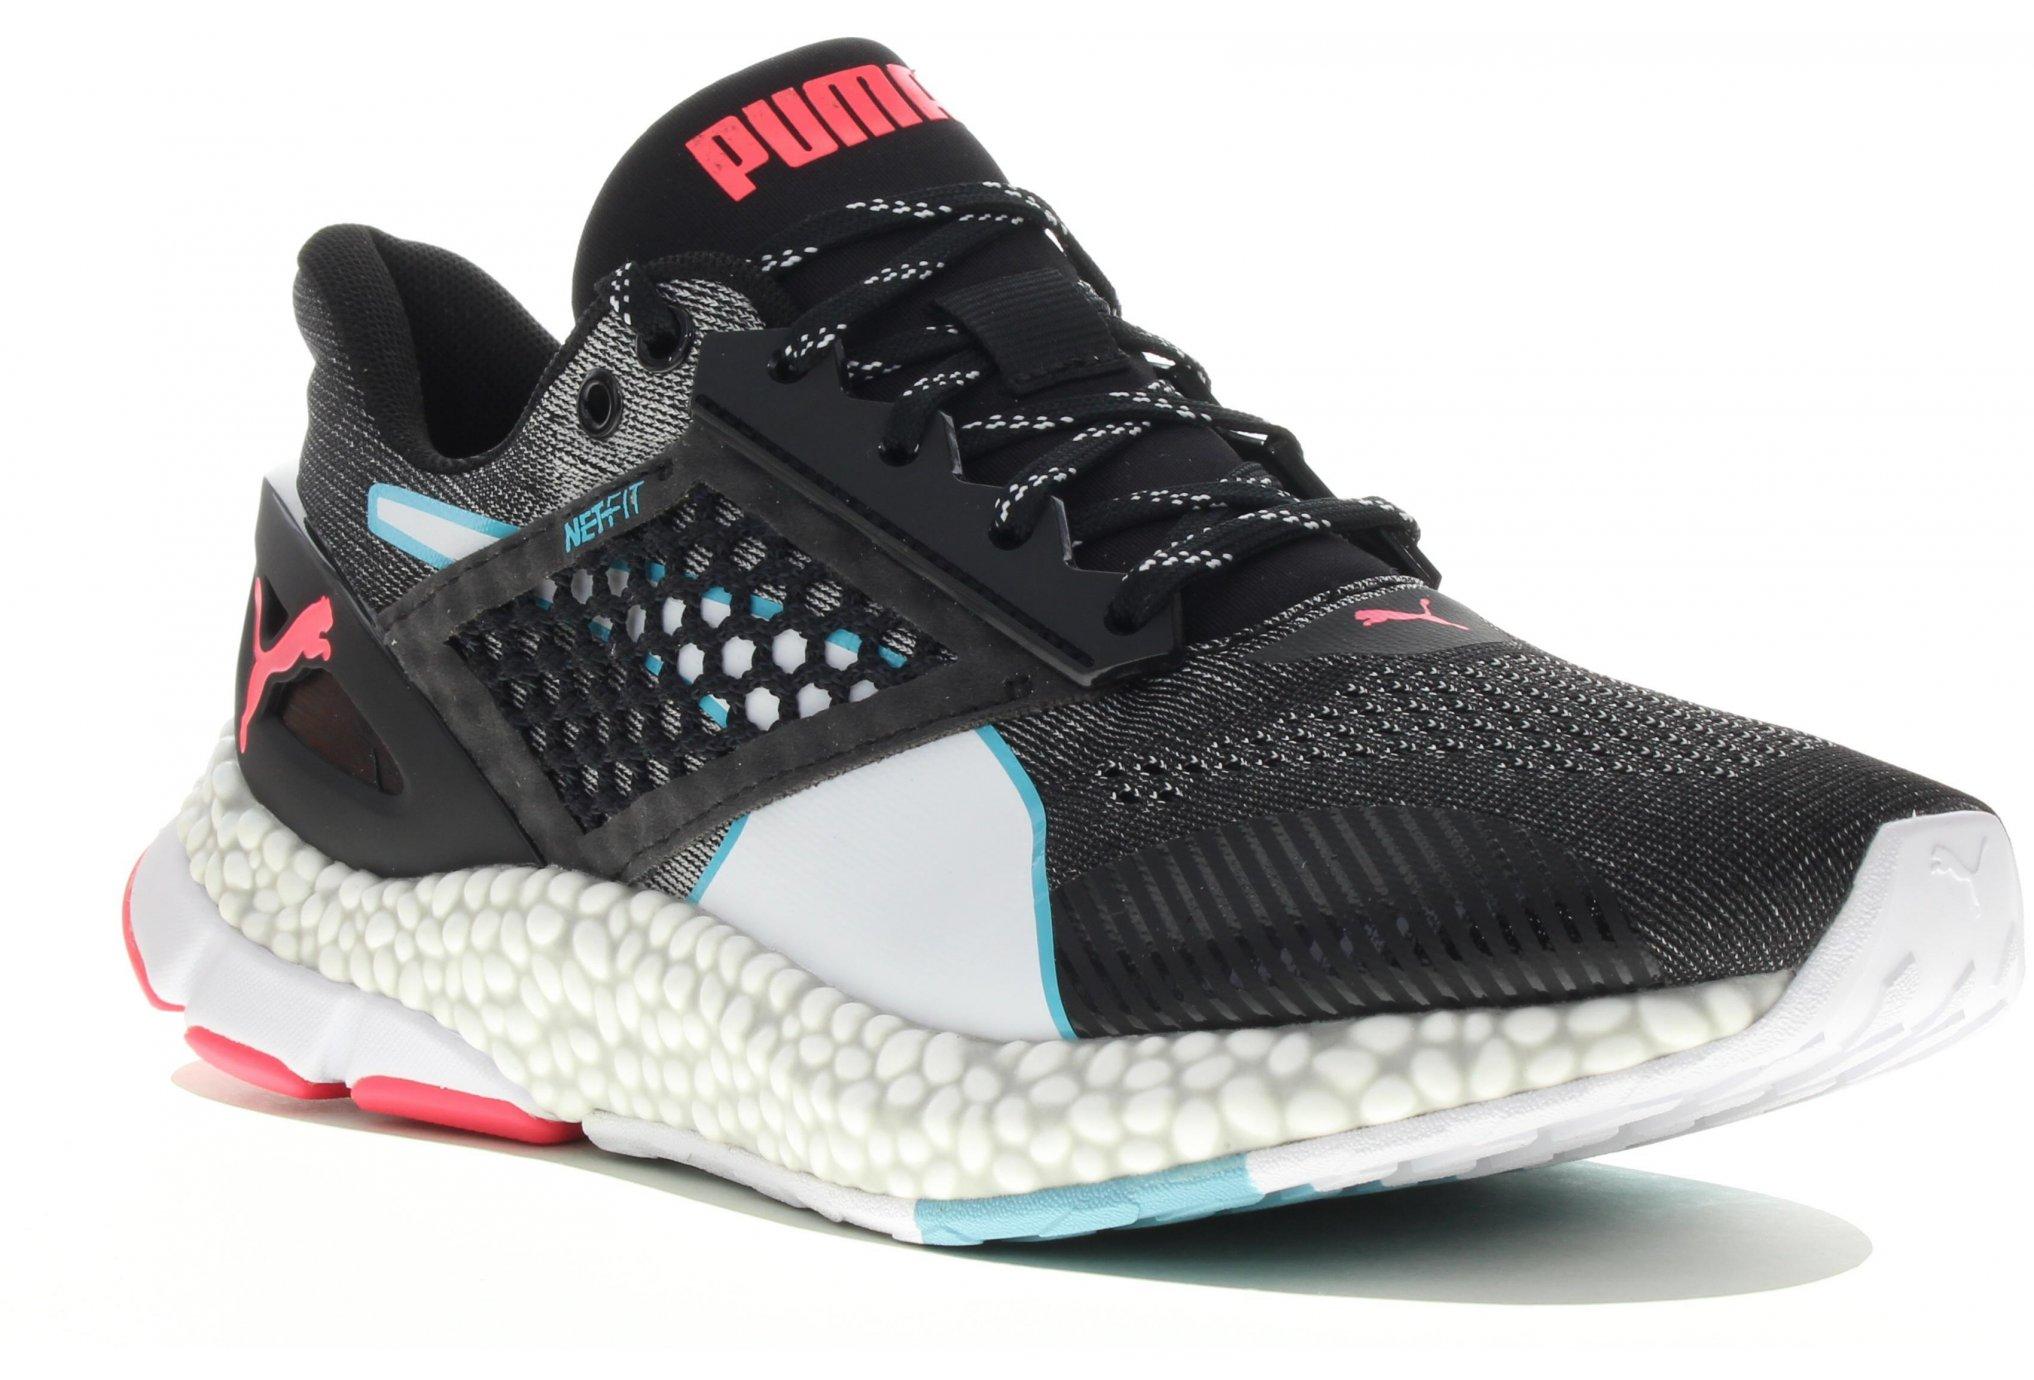 Puma Hybrid Astro W Chaussures running femme